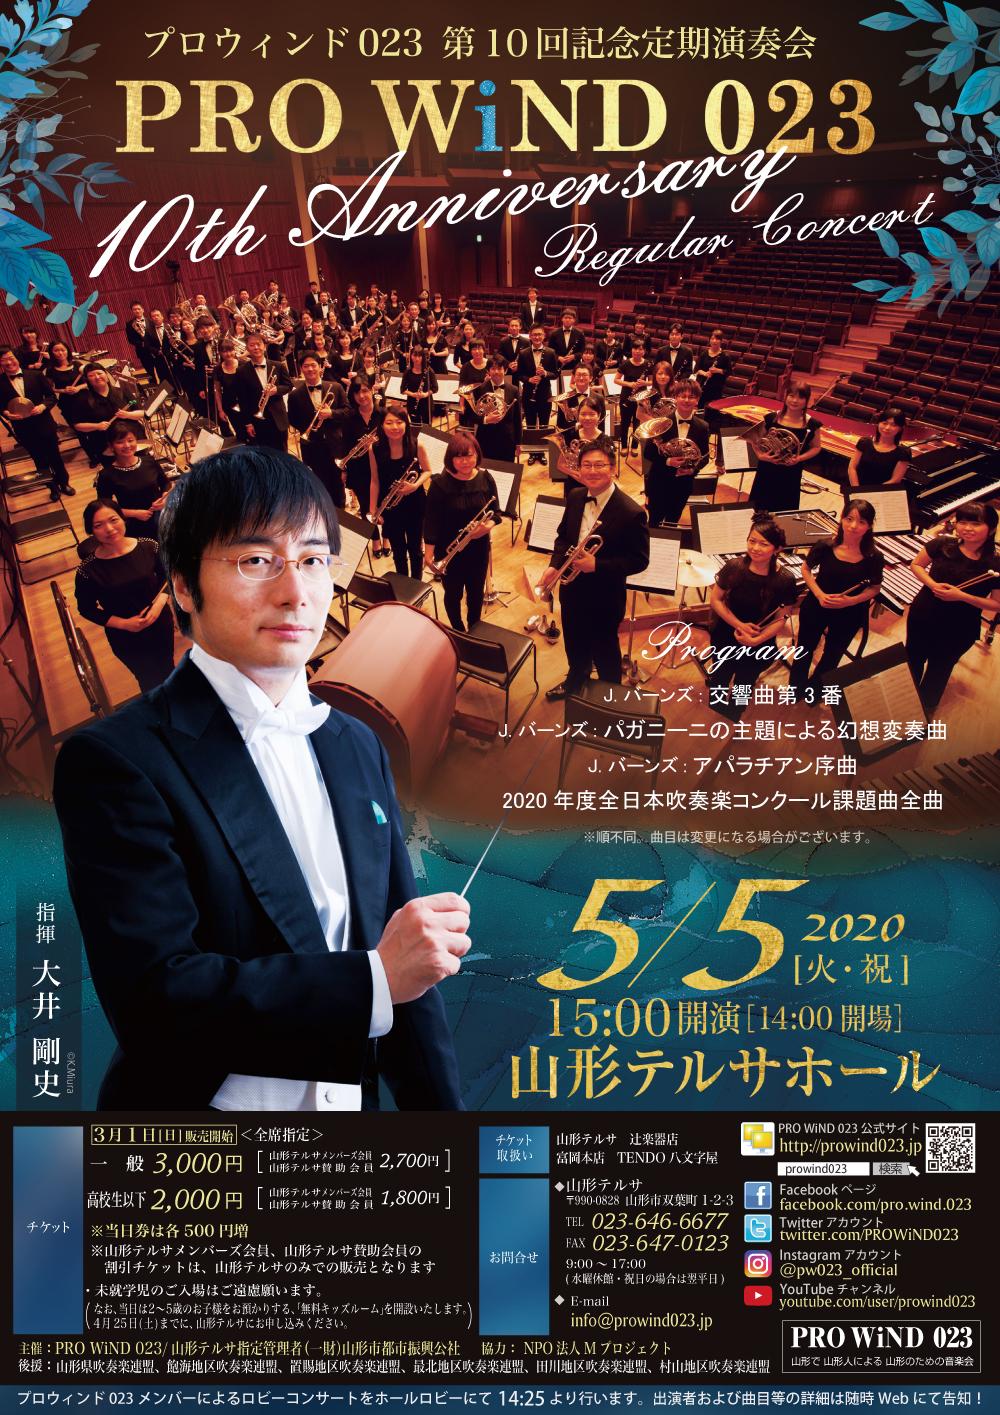 PRO WiND 023<br> 第10回記念定期演奏会